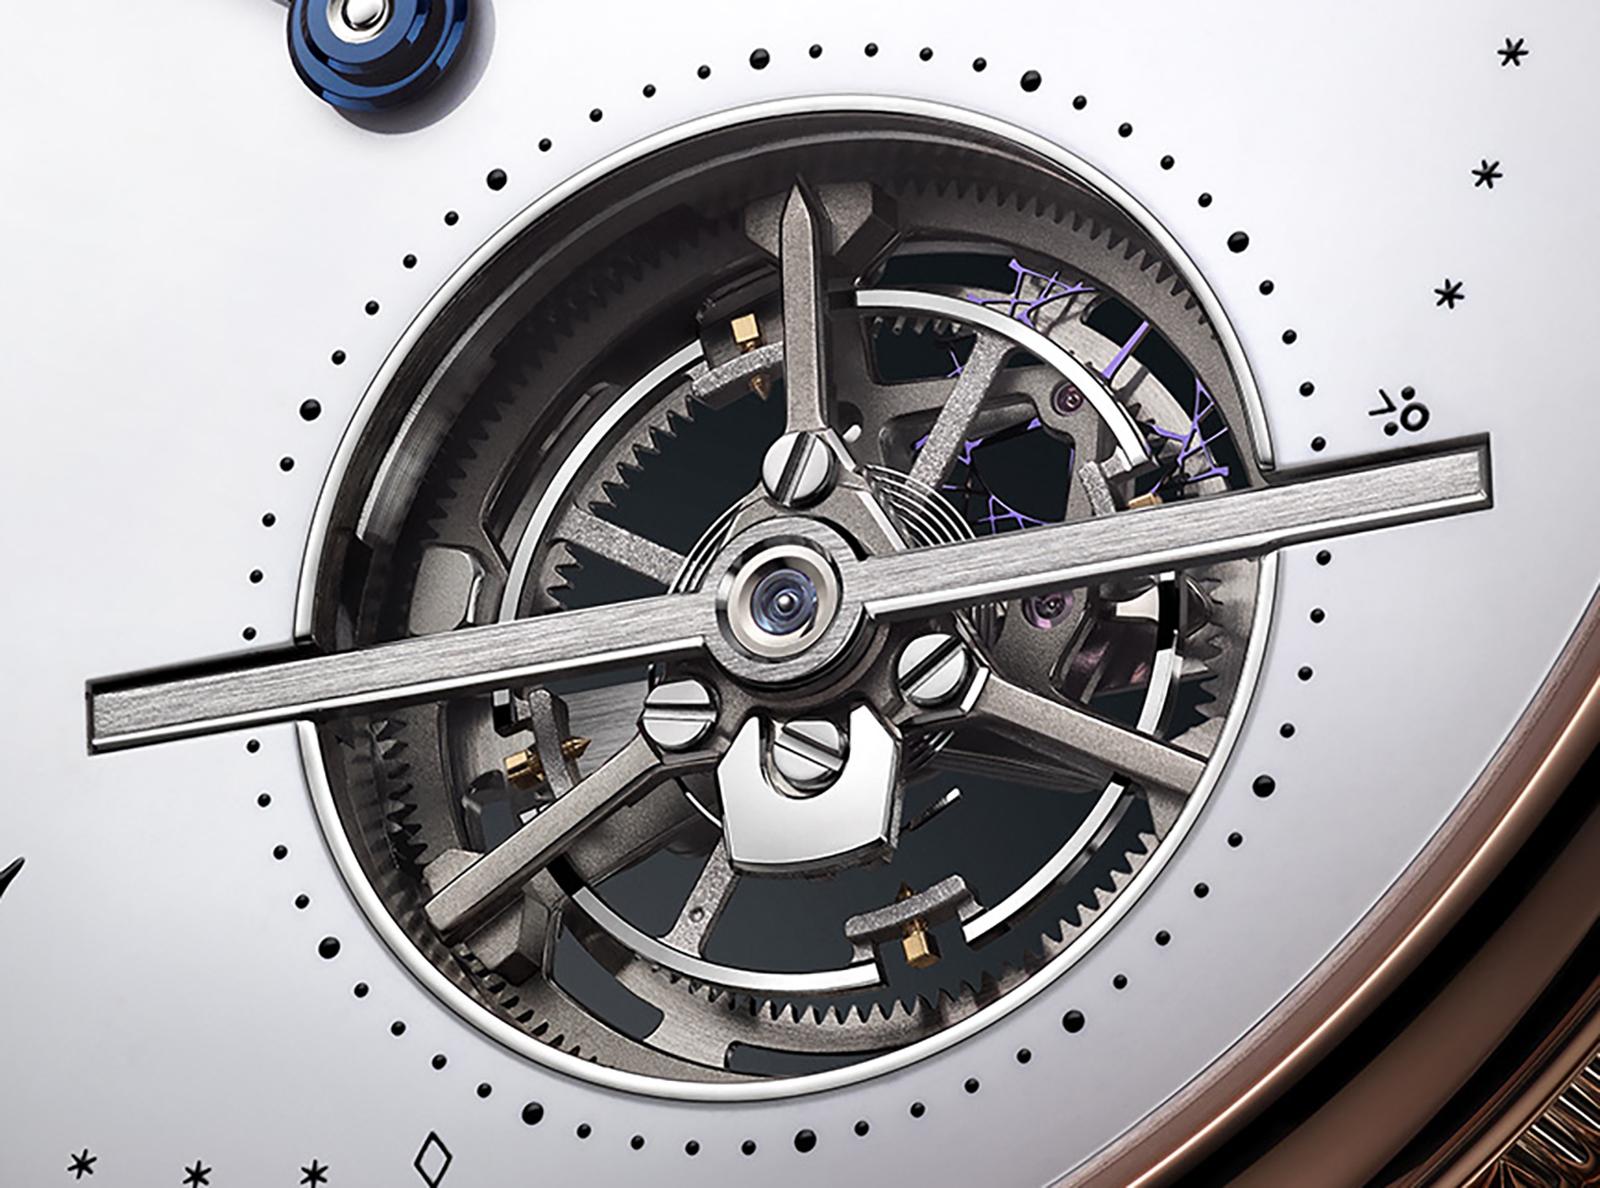 Breguet Classique Tourbillon Extra-Plat Automatique 5367 5